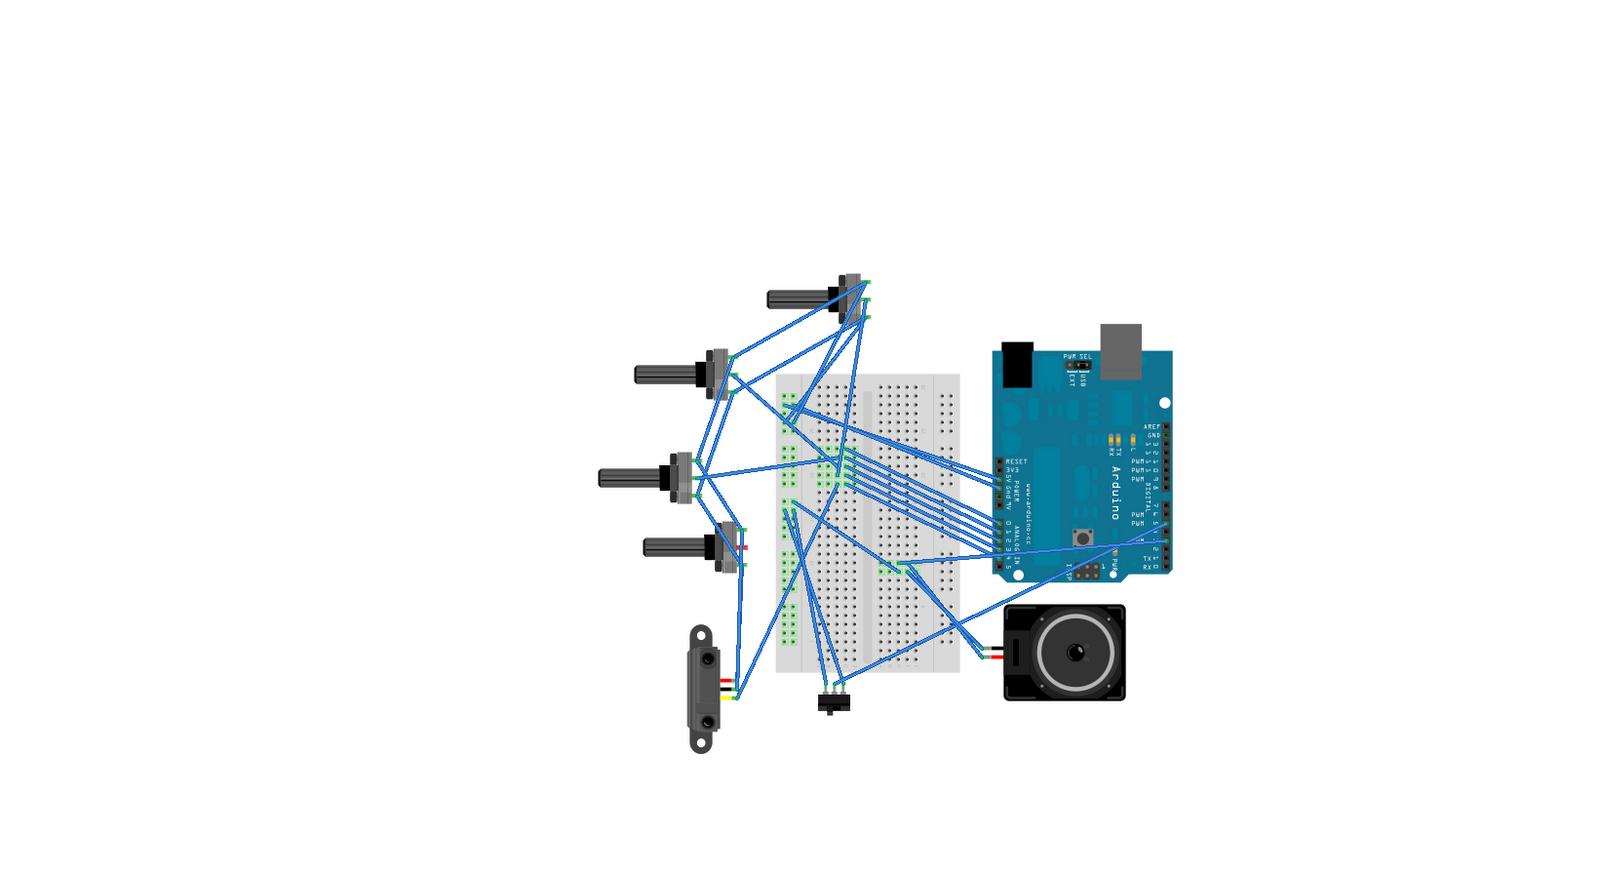 Helmizuhdi Journal Fyp August 2010 Theremin Circuit Diagram Breadboard Arduino Synthesizer 101 My Schematic